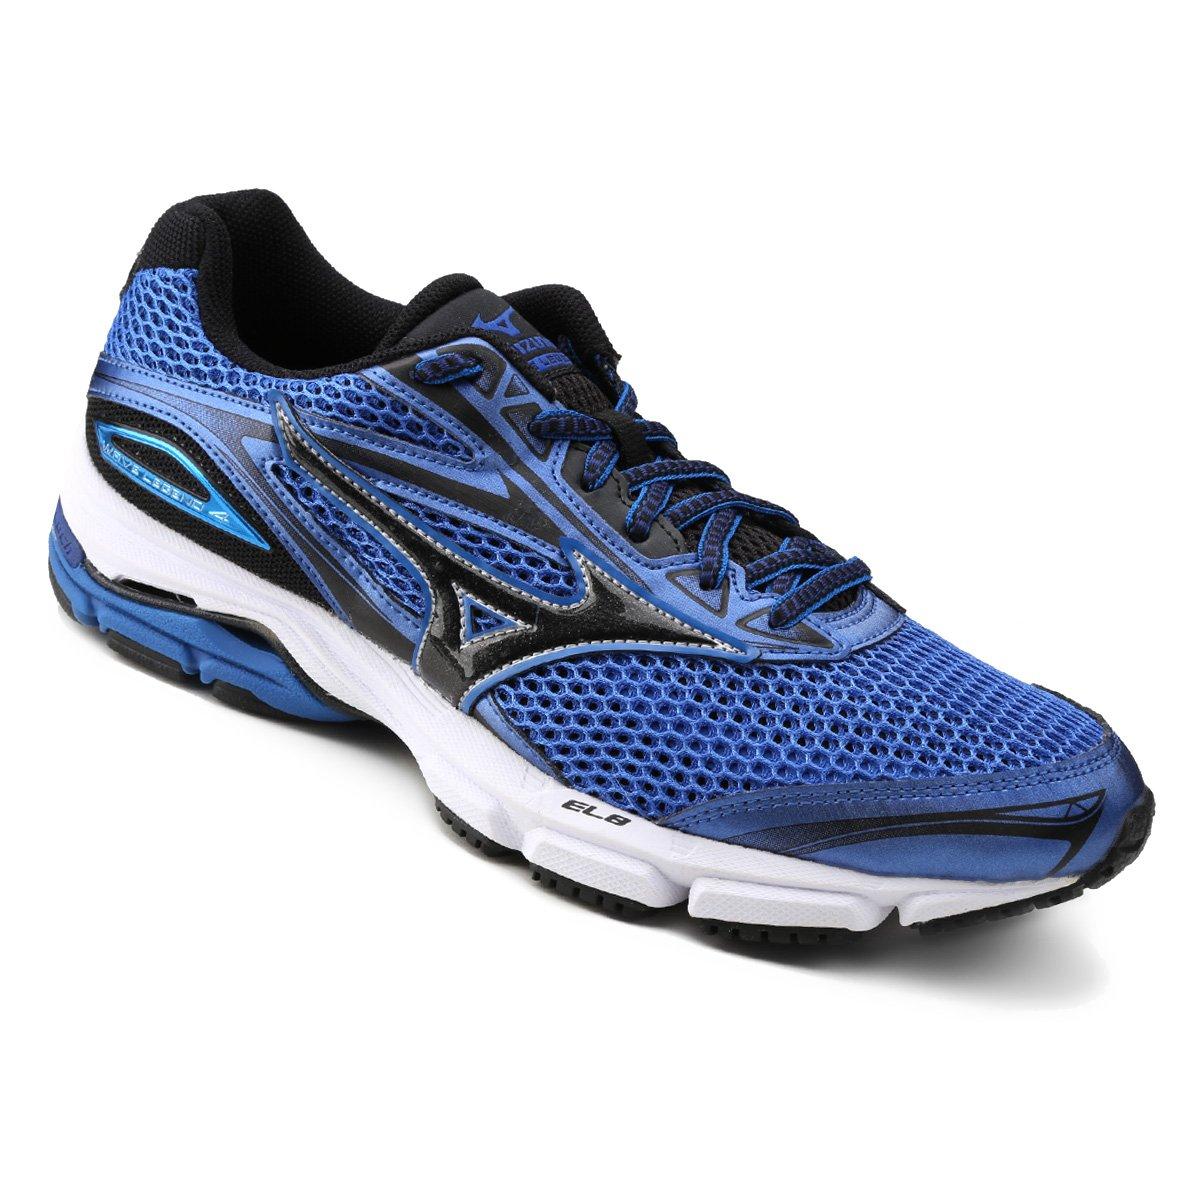 Tênis Mizuno Wave Legend 4 P Masculino - Azul e Preto - Compre Agora ... 9662628697ca5